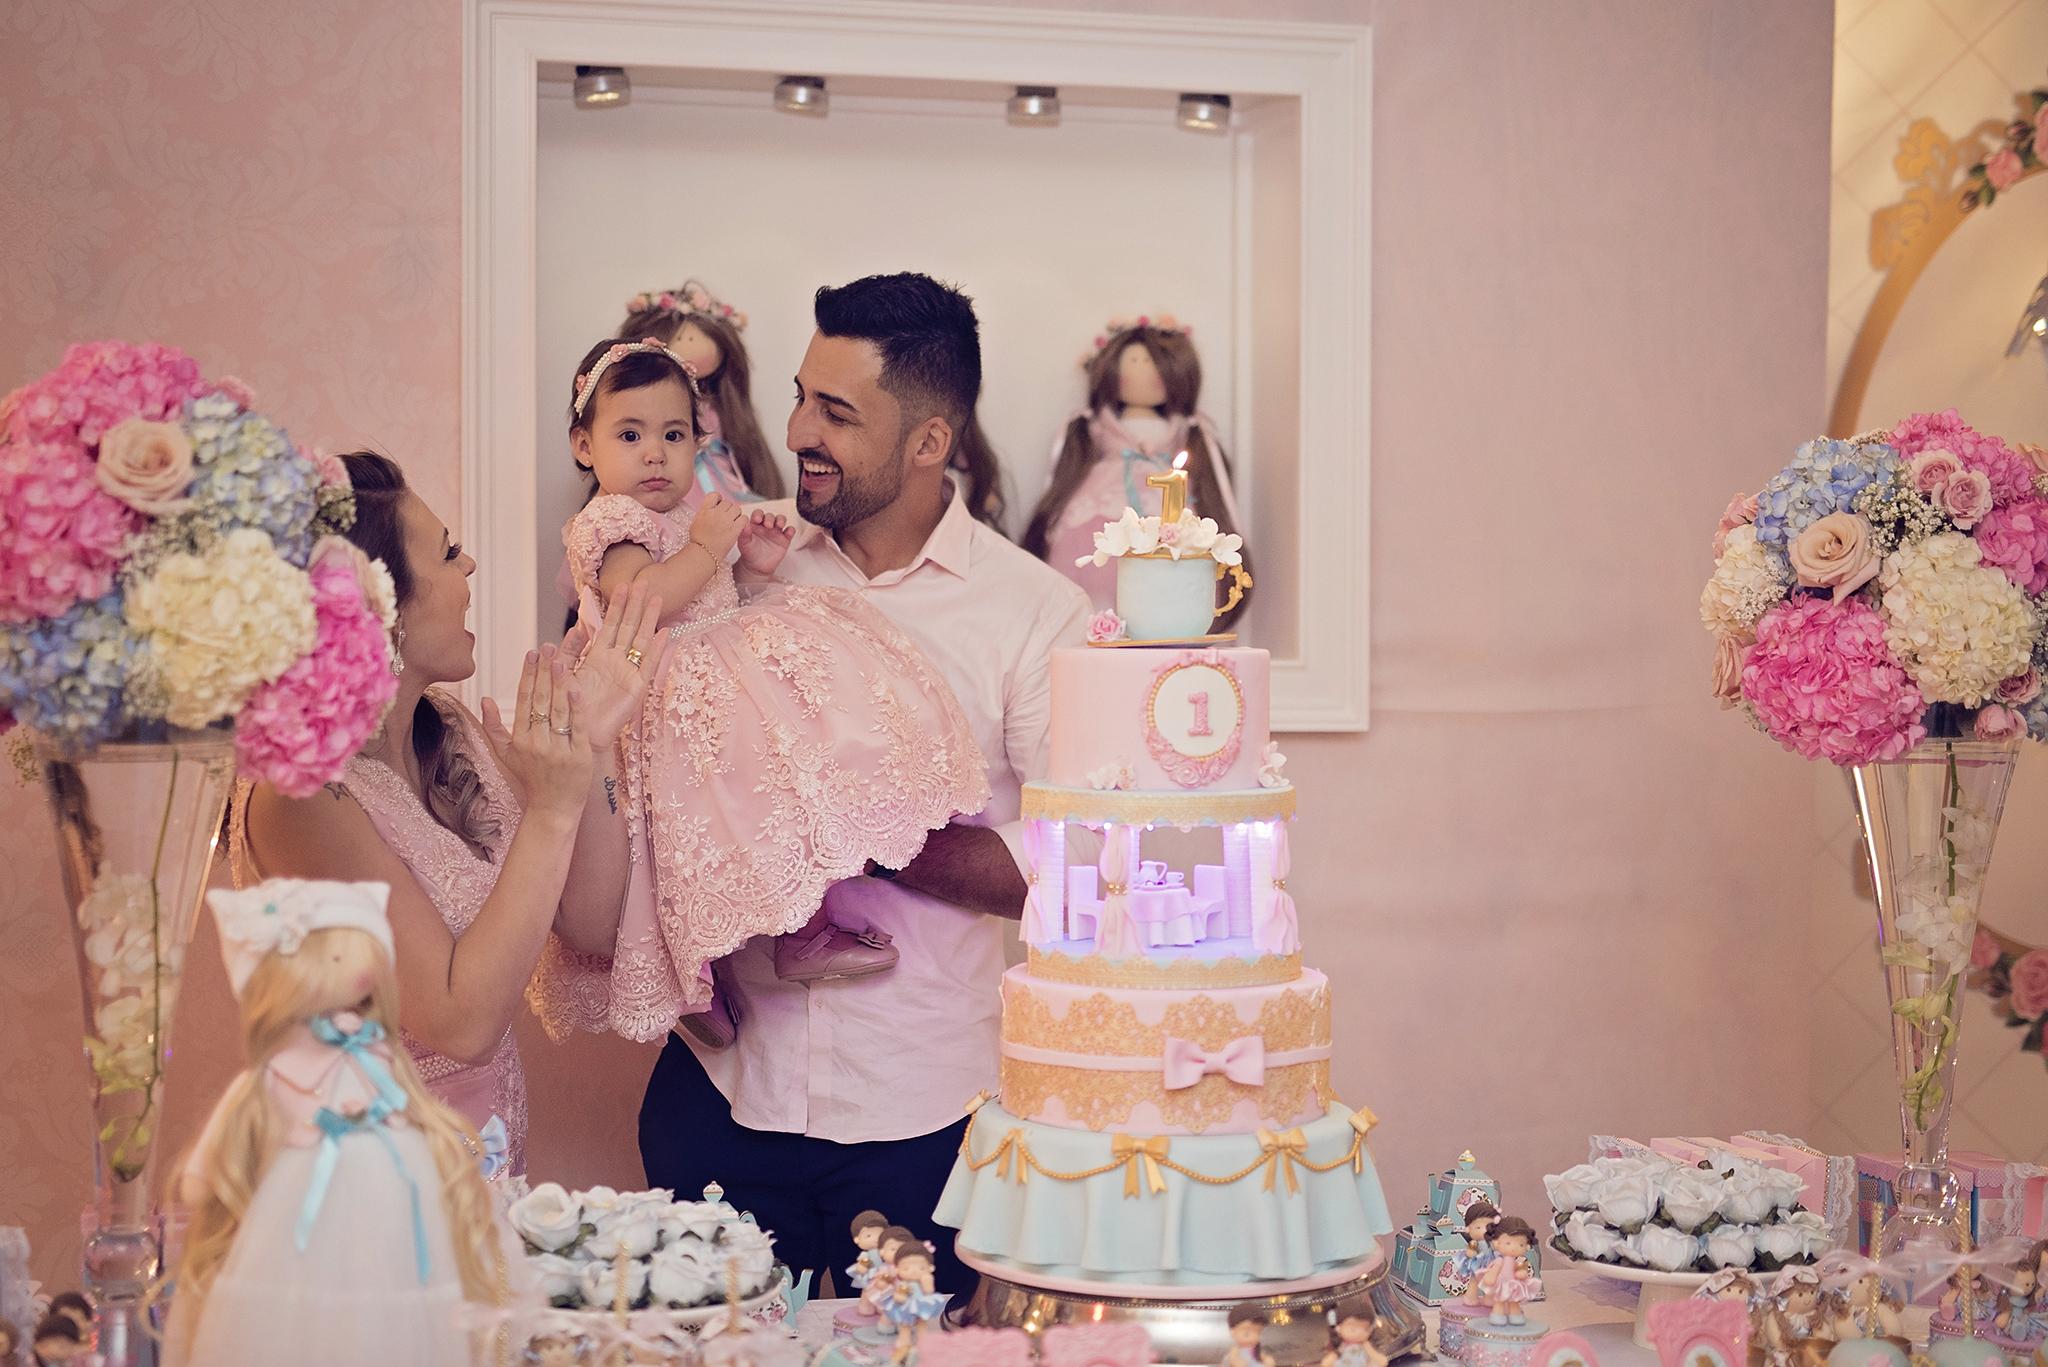 NJ-NY-cakesmash-birthday-Photographer-170.JPG